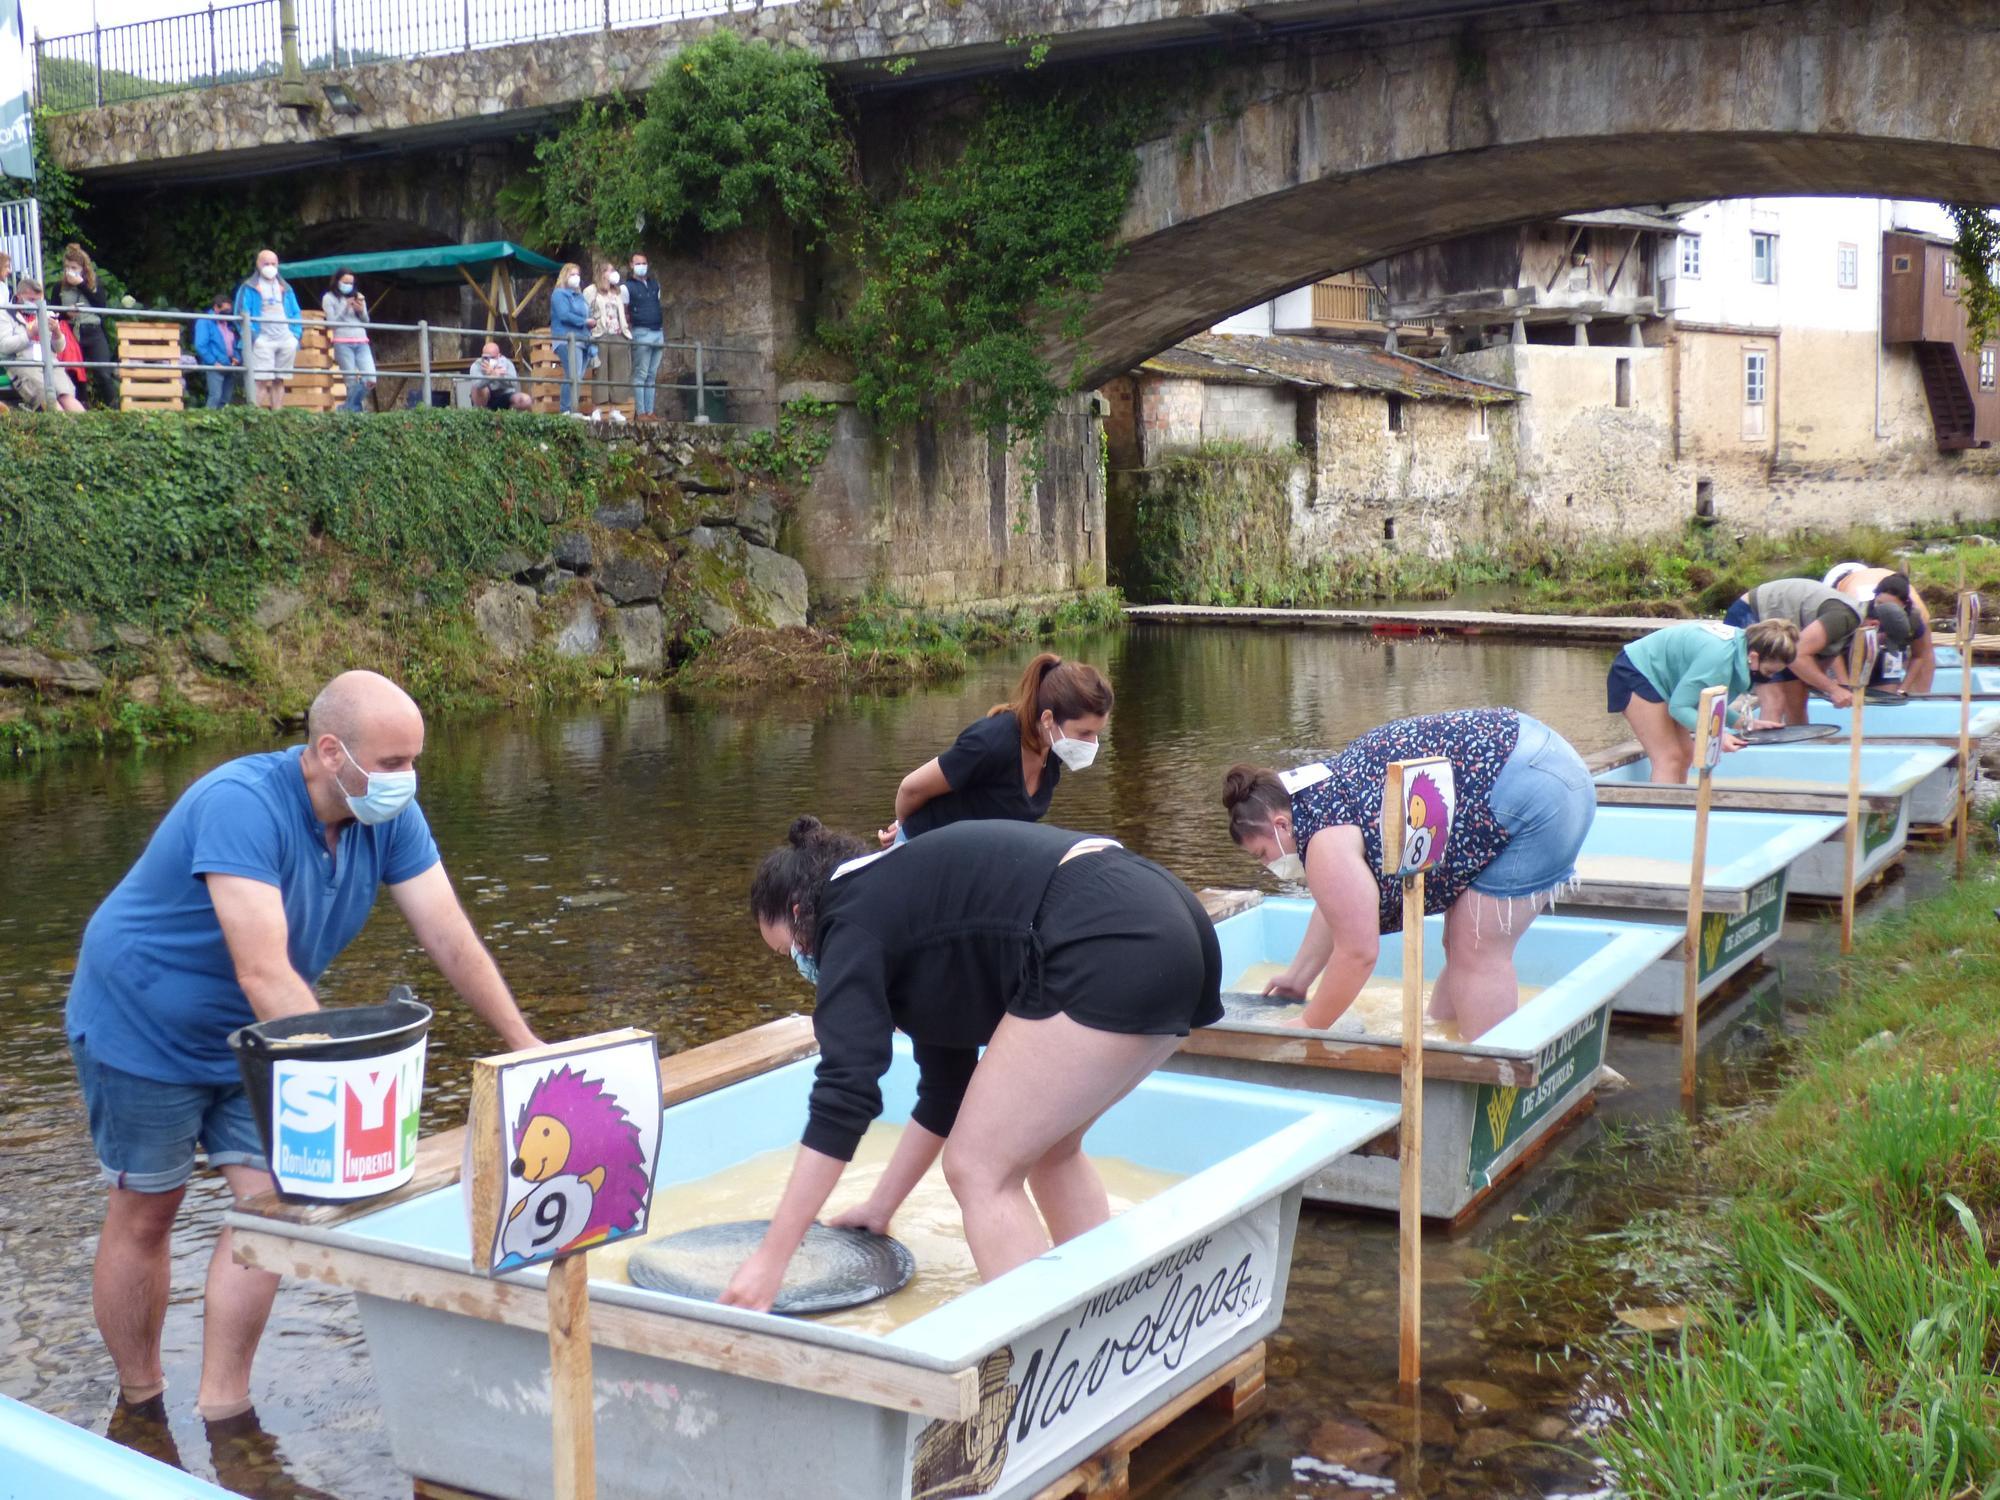 Campeonato nacional de bateo de oro en Navelgas